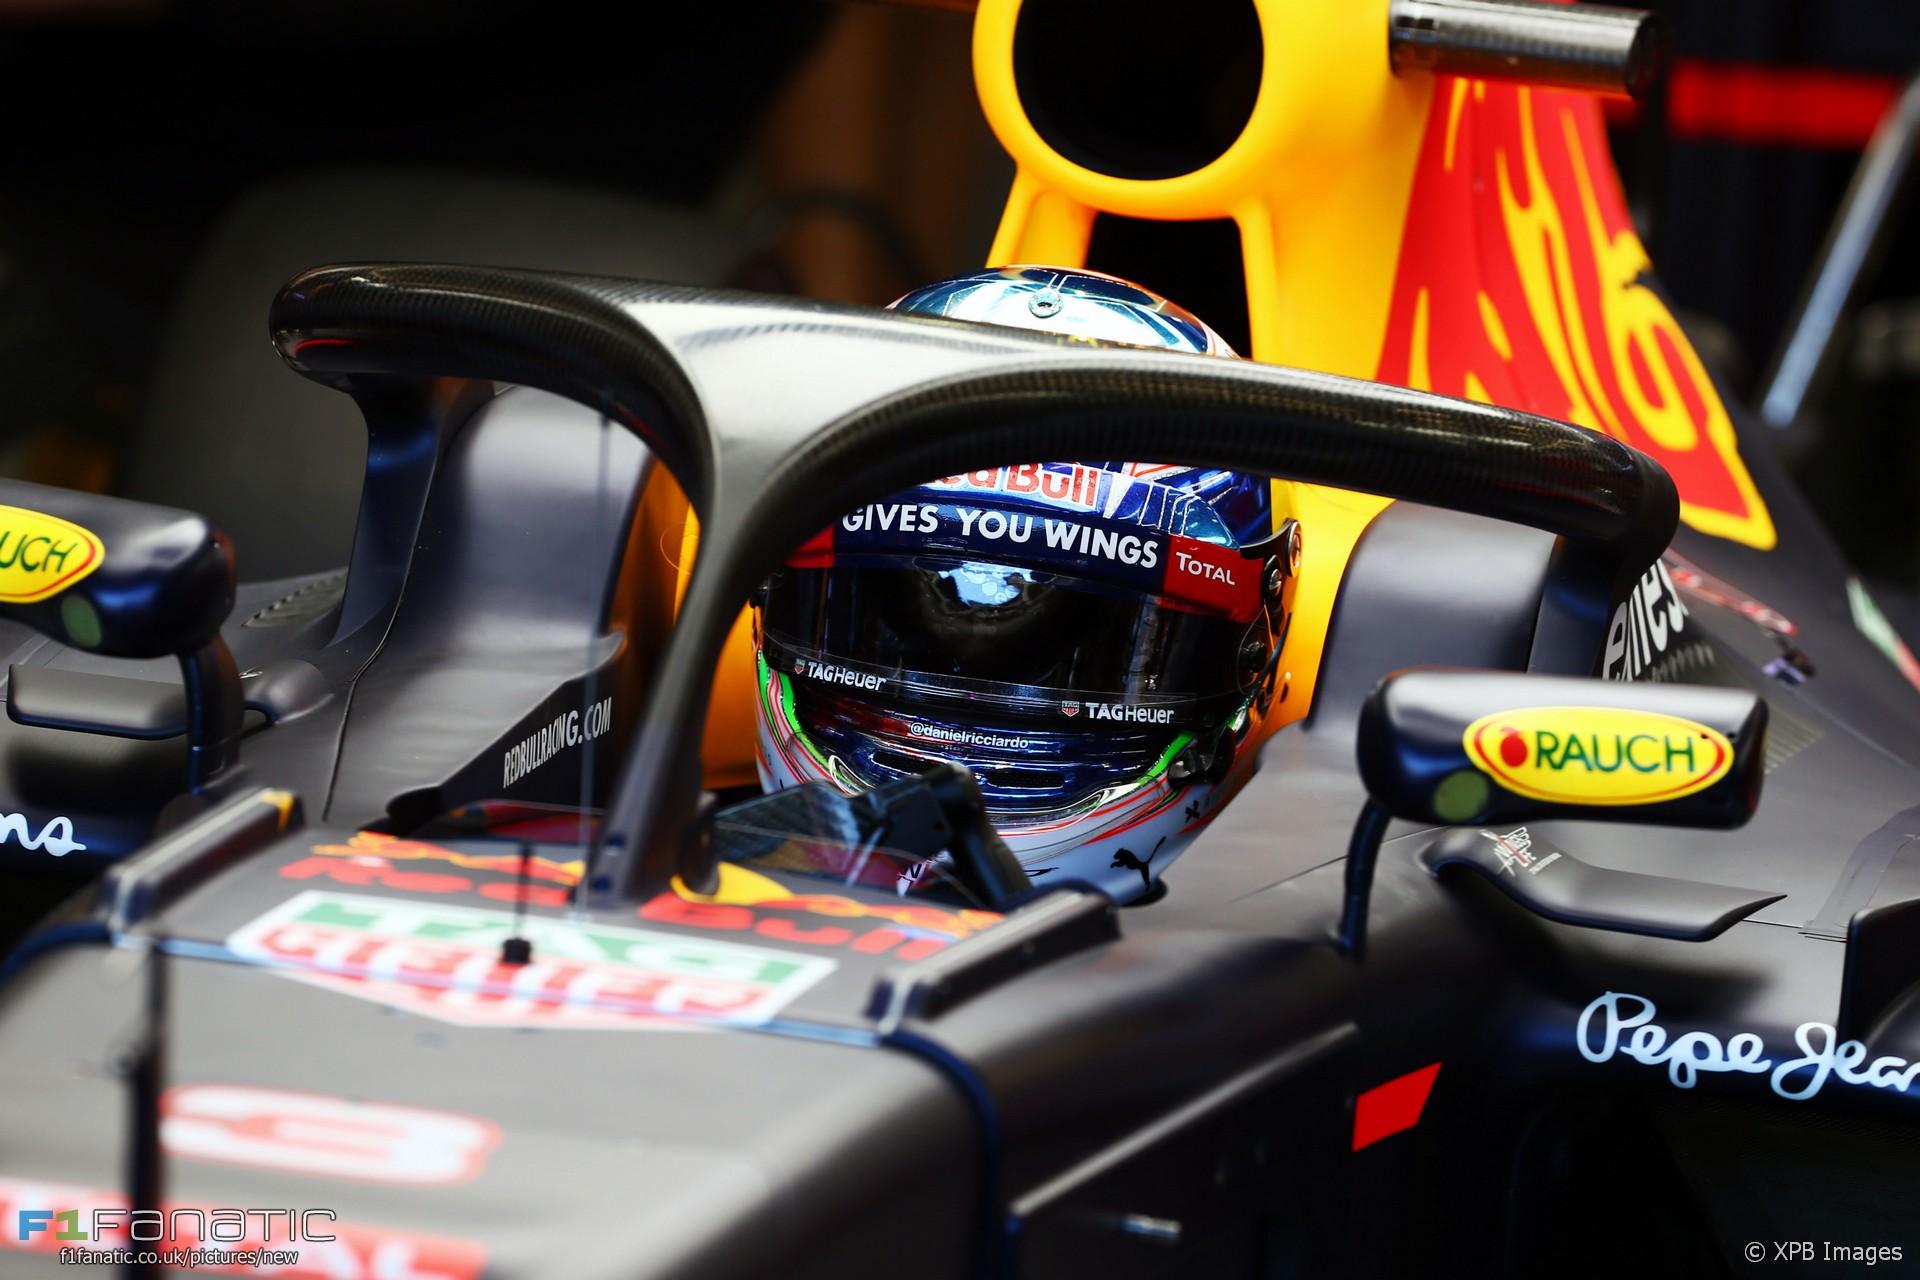 Daniel Ricciardo, Red Bull, Spa-Francorchamps, 2016